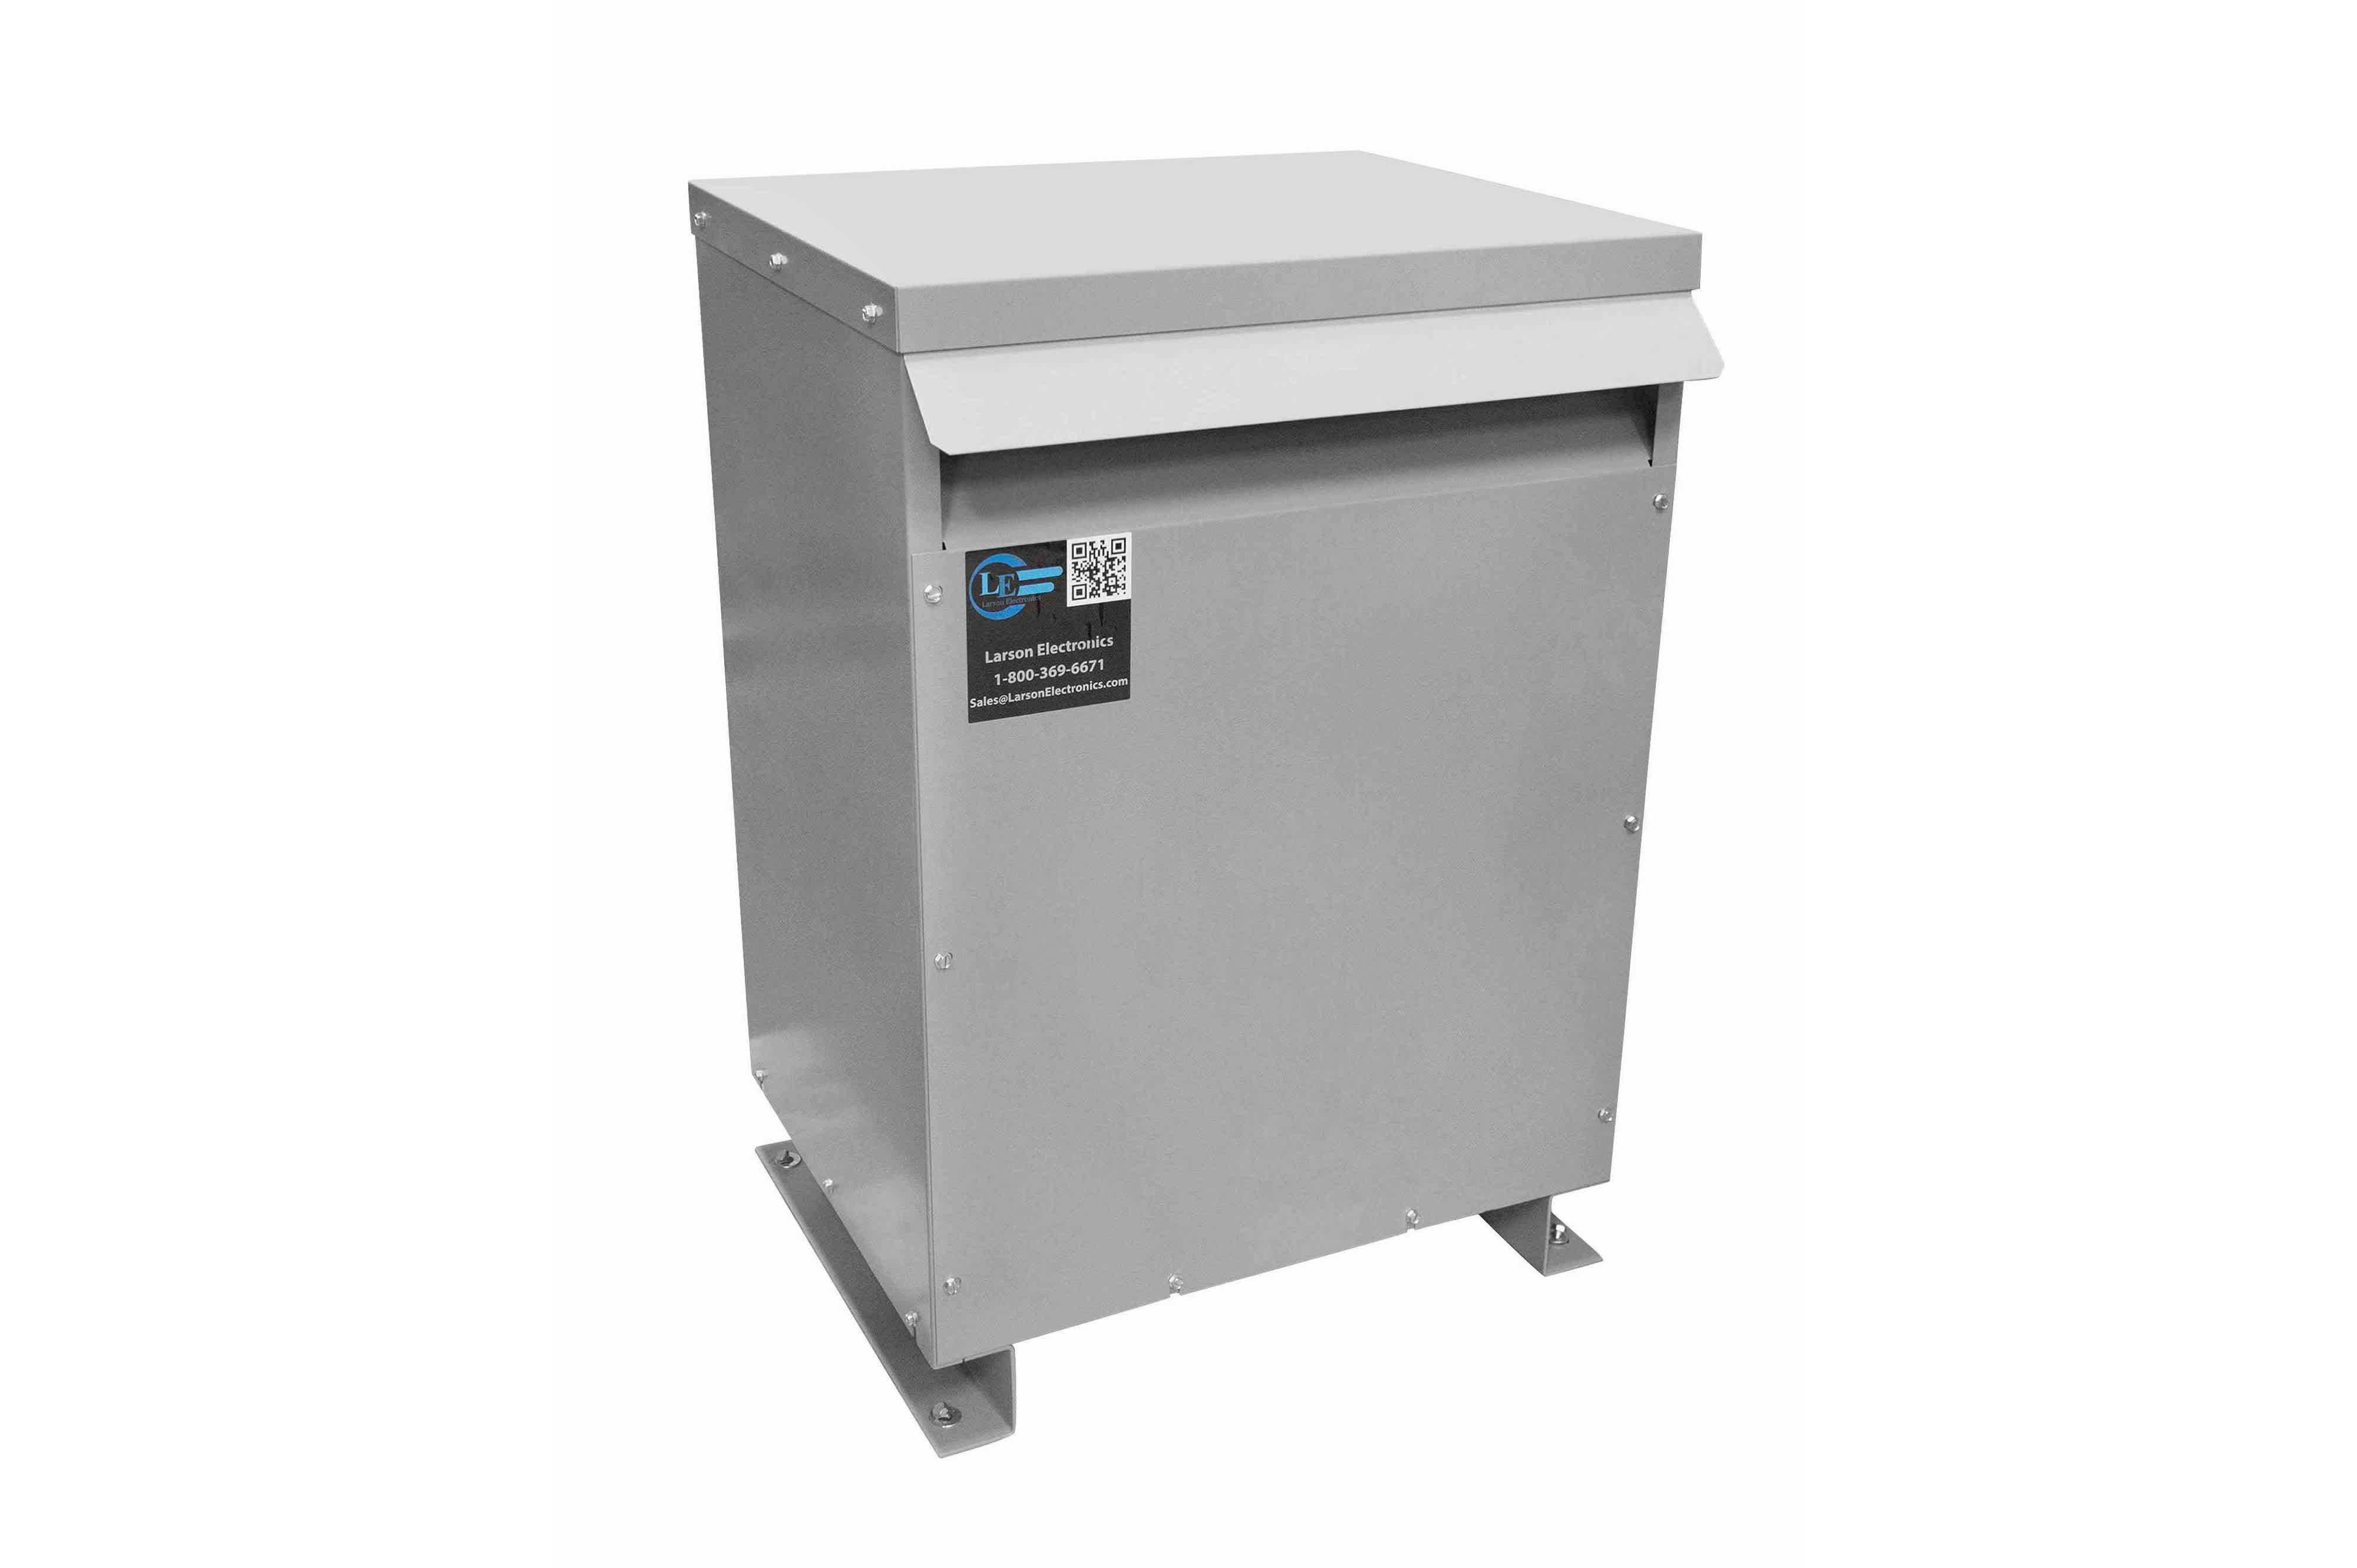 20 kVA 3PH Isolation Transformer, 480V Wye Primary, 575V Delta Secondary, N3R, Ventilated, 60 Hz